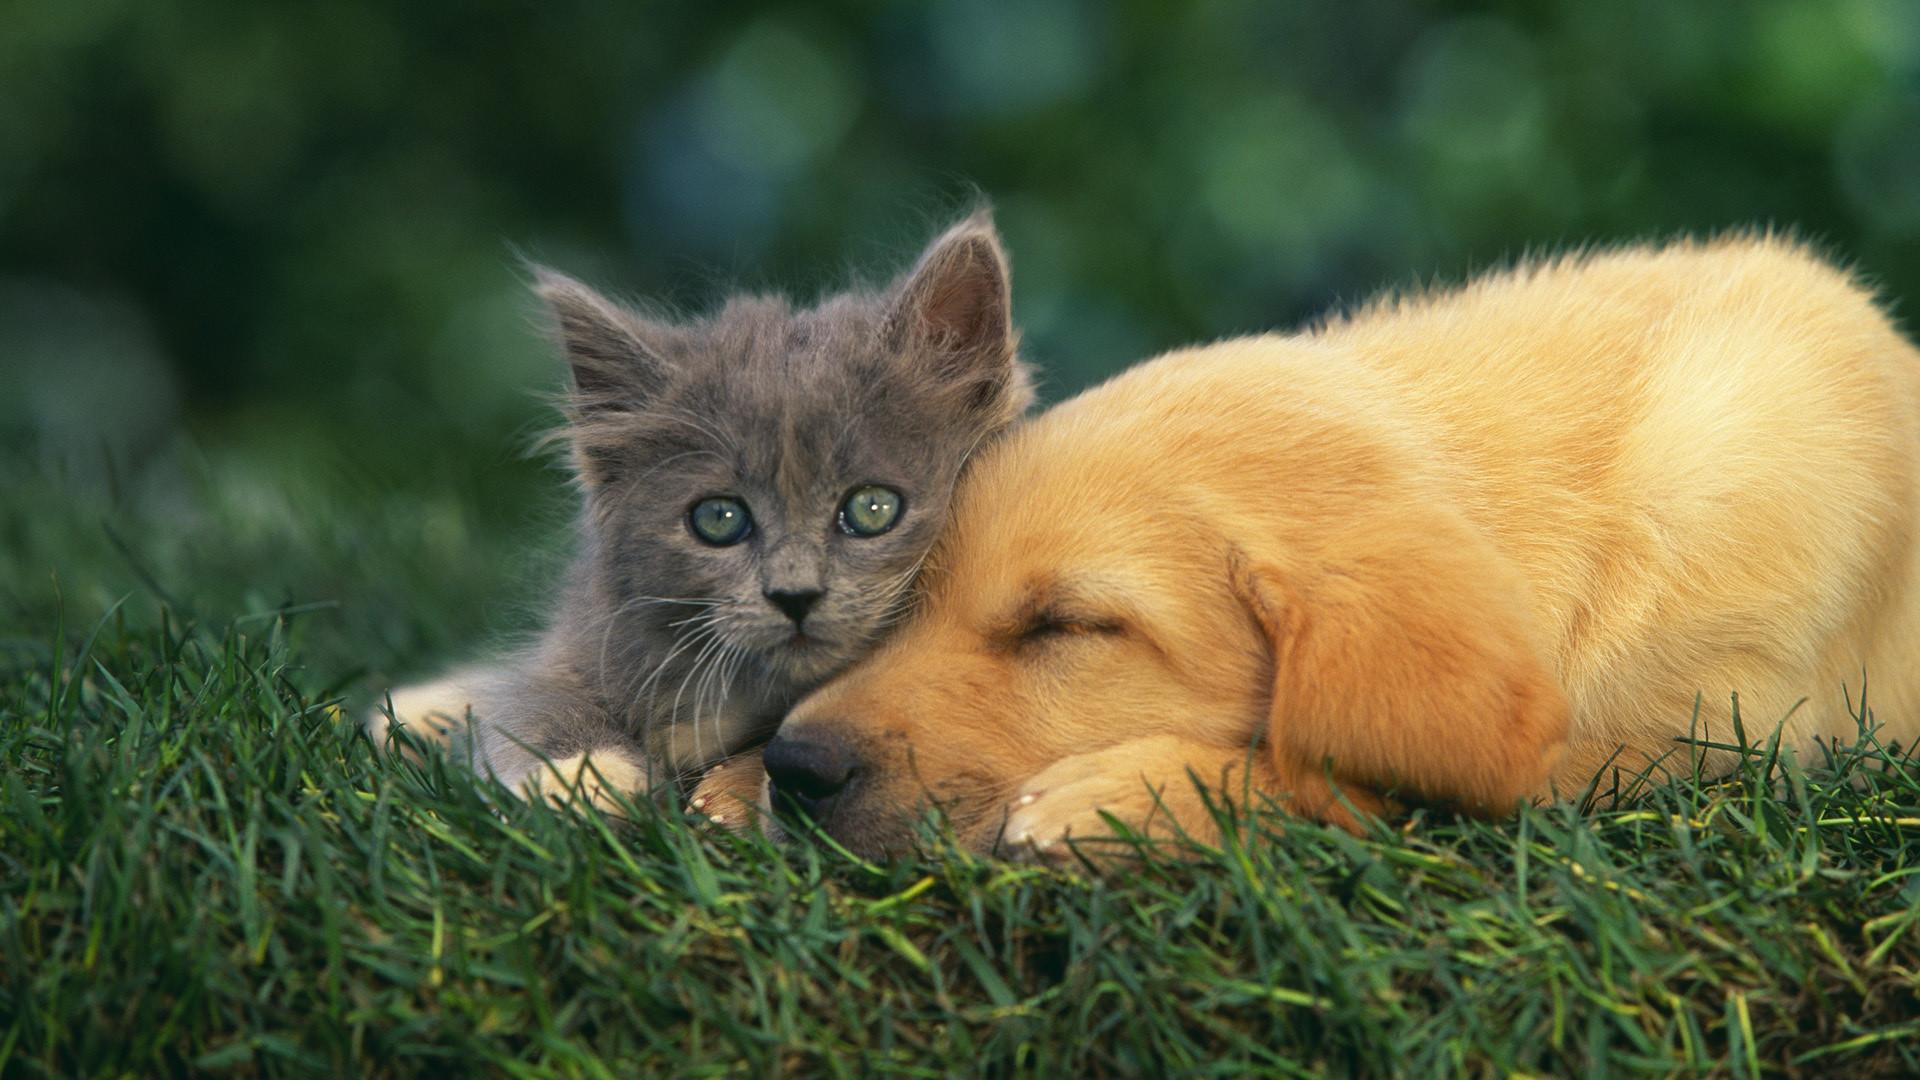 Cat and Dog Wallpaper | HD Desktop Wallpapers